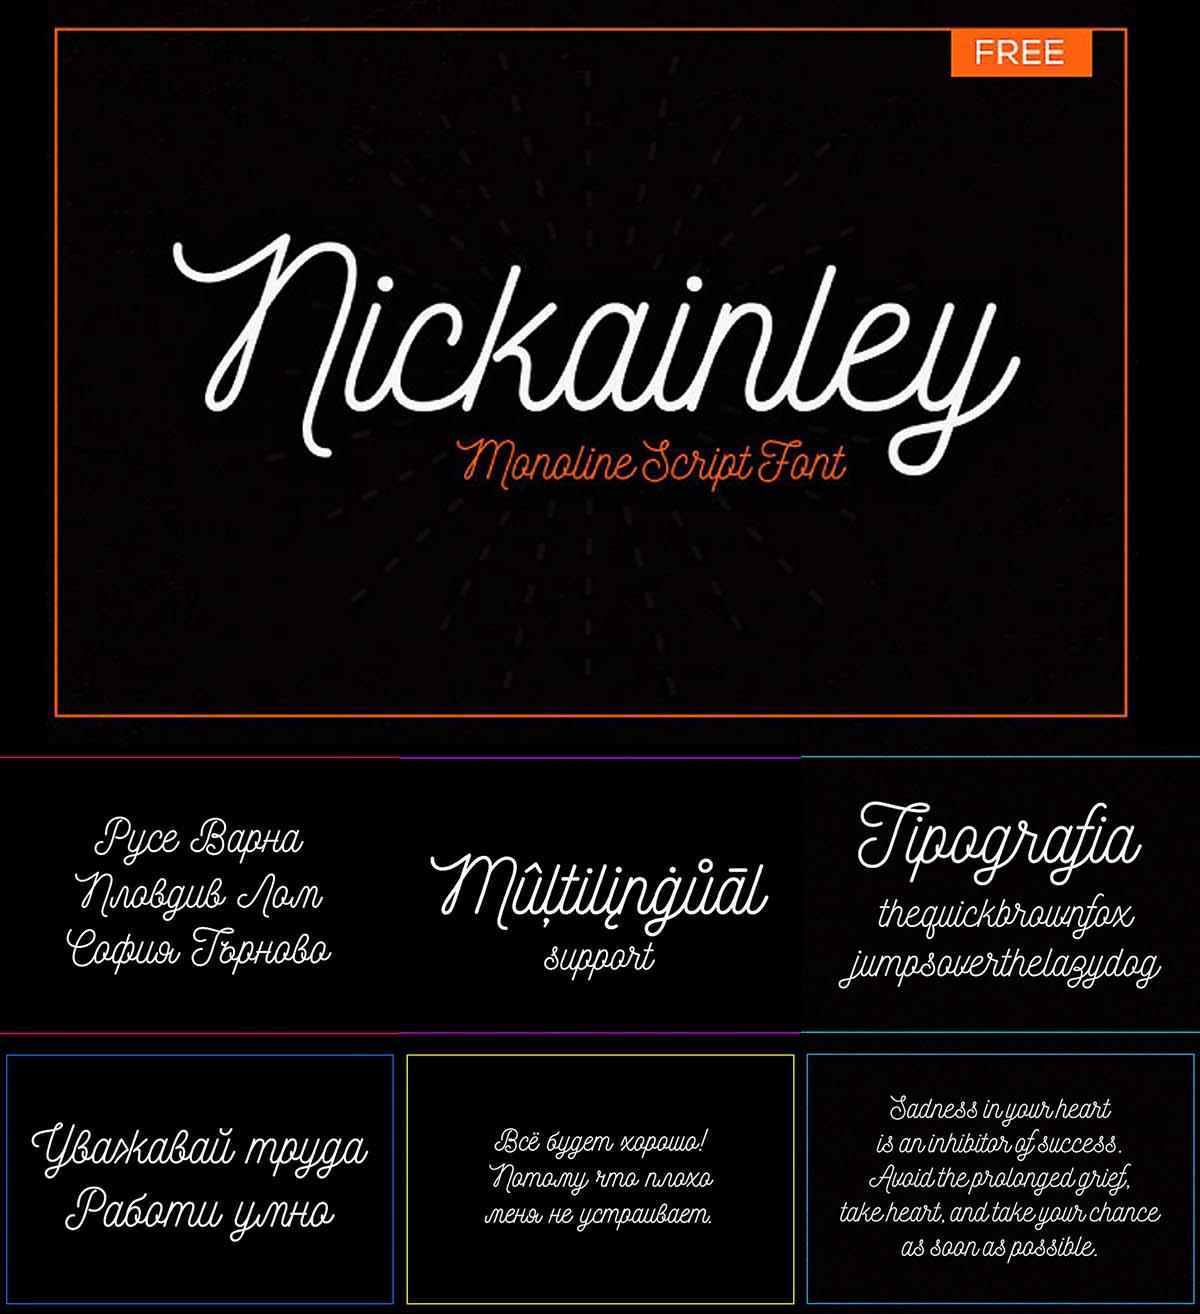 Nickainley multilingual font